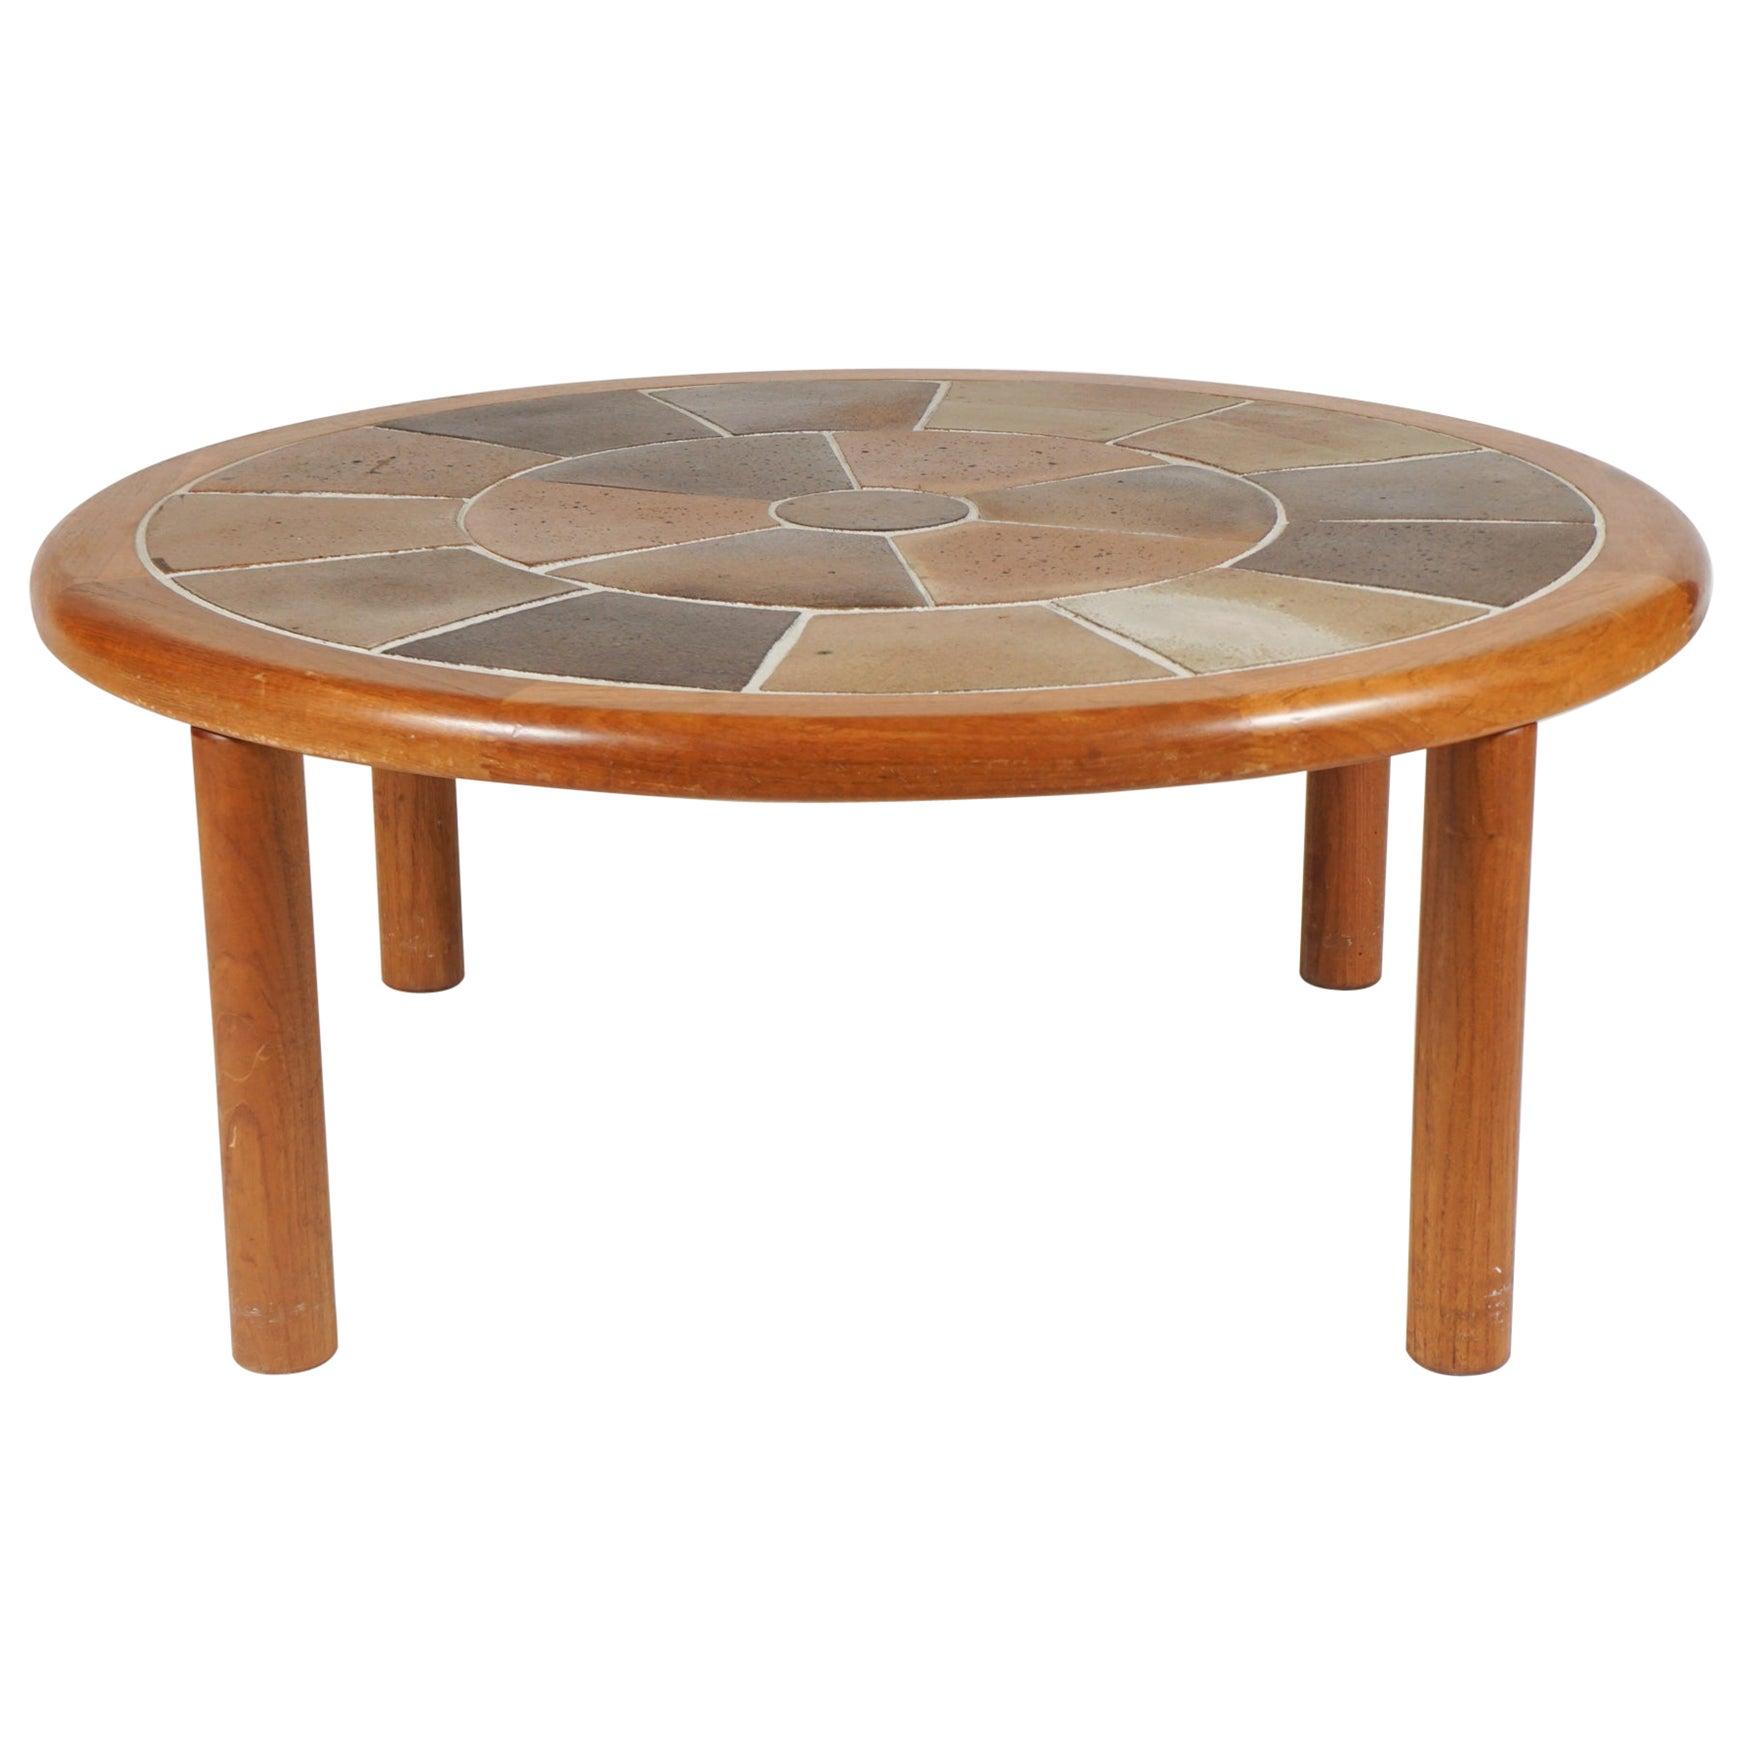 Tue Poulsen Designed Ceramic Tile & Teak Coffee / Center Table by Haslev, Hygge